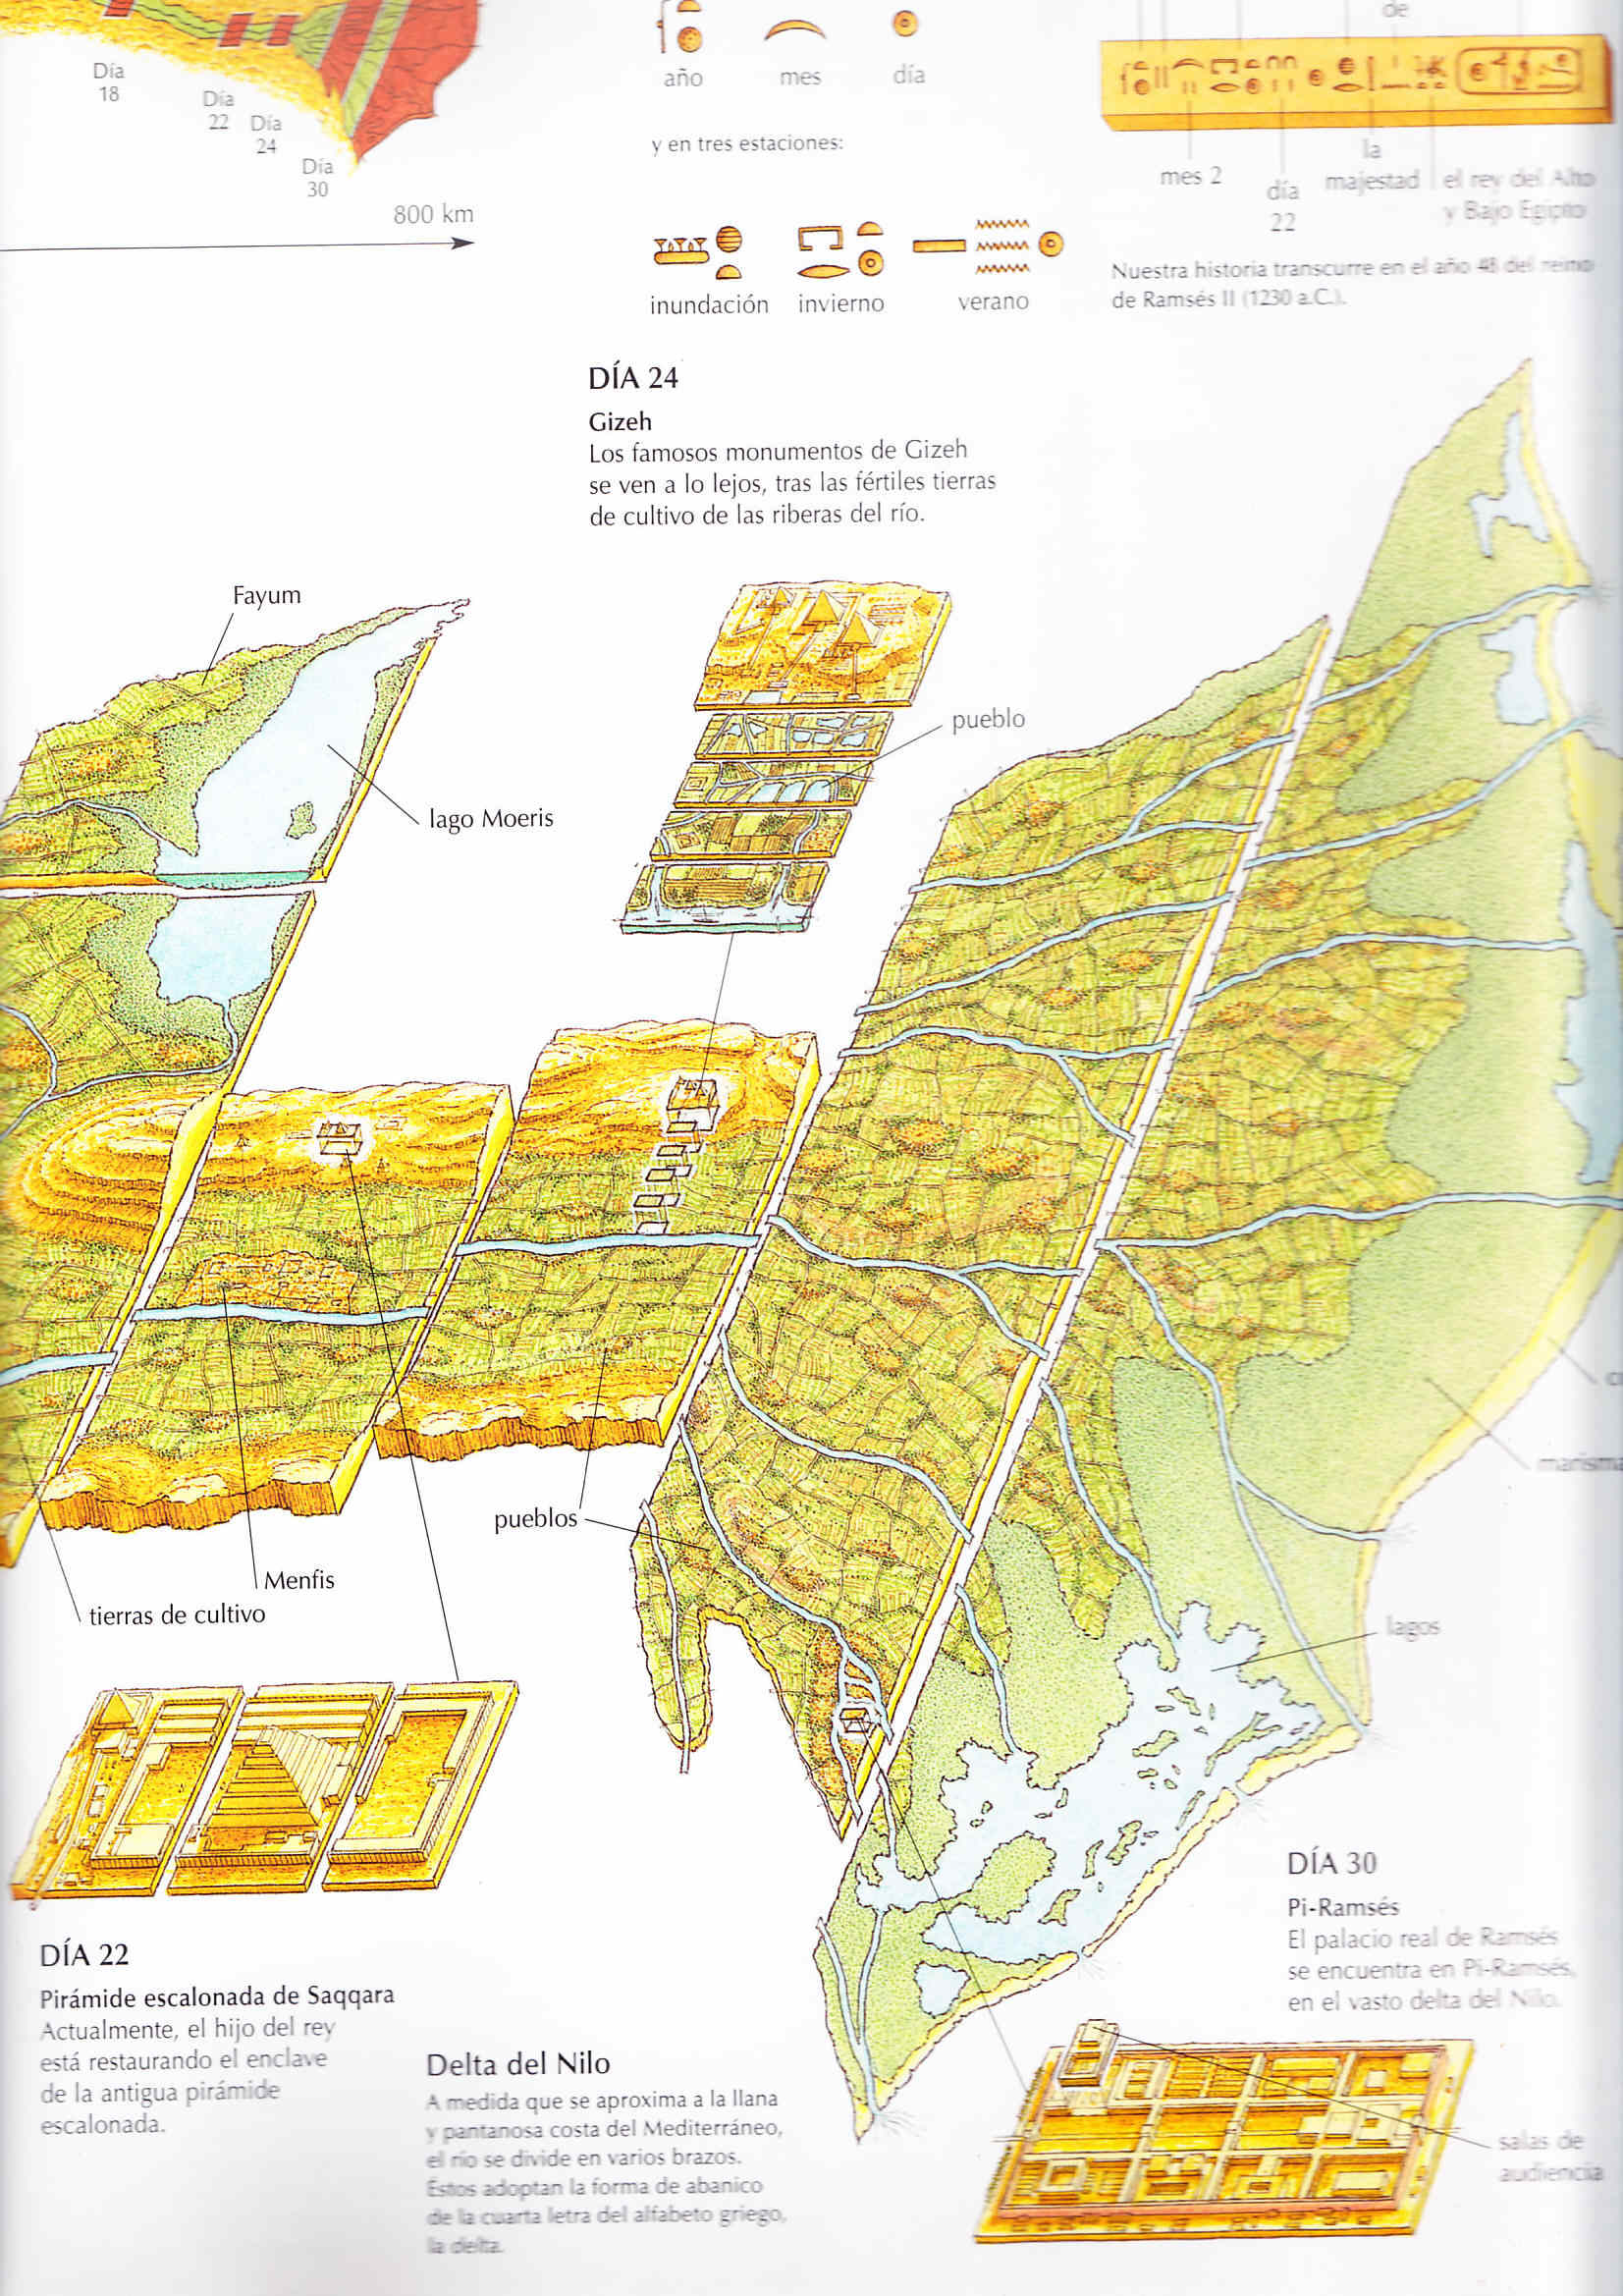 Egipto antiguo 38 y Ptolomeo V Epifanes 6 Egipto antiguo 38 y Ptolomeo V Epifanes 6 Egipto antiguo 38 y Ptolomeo V Epifanes 6